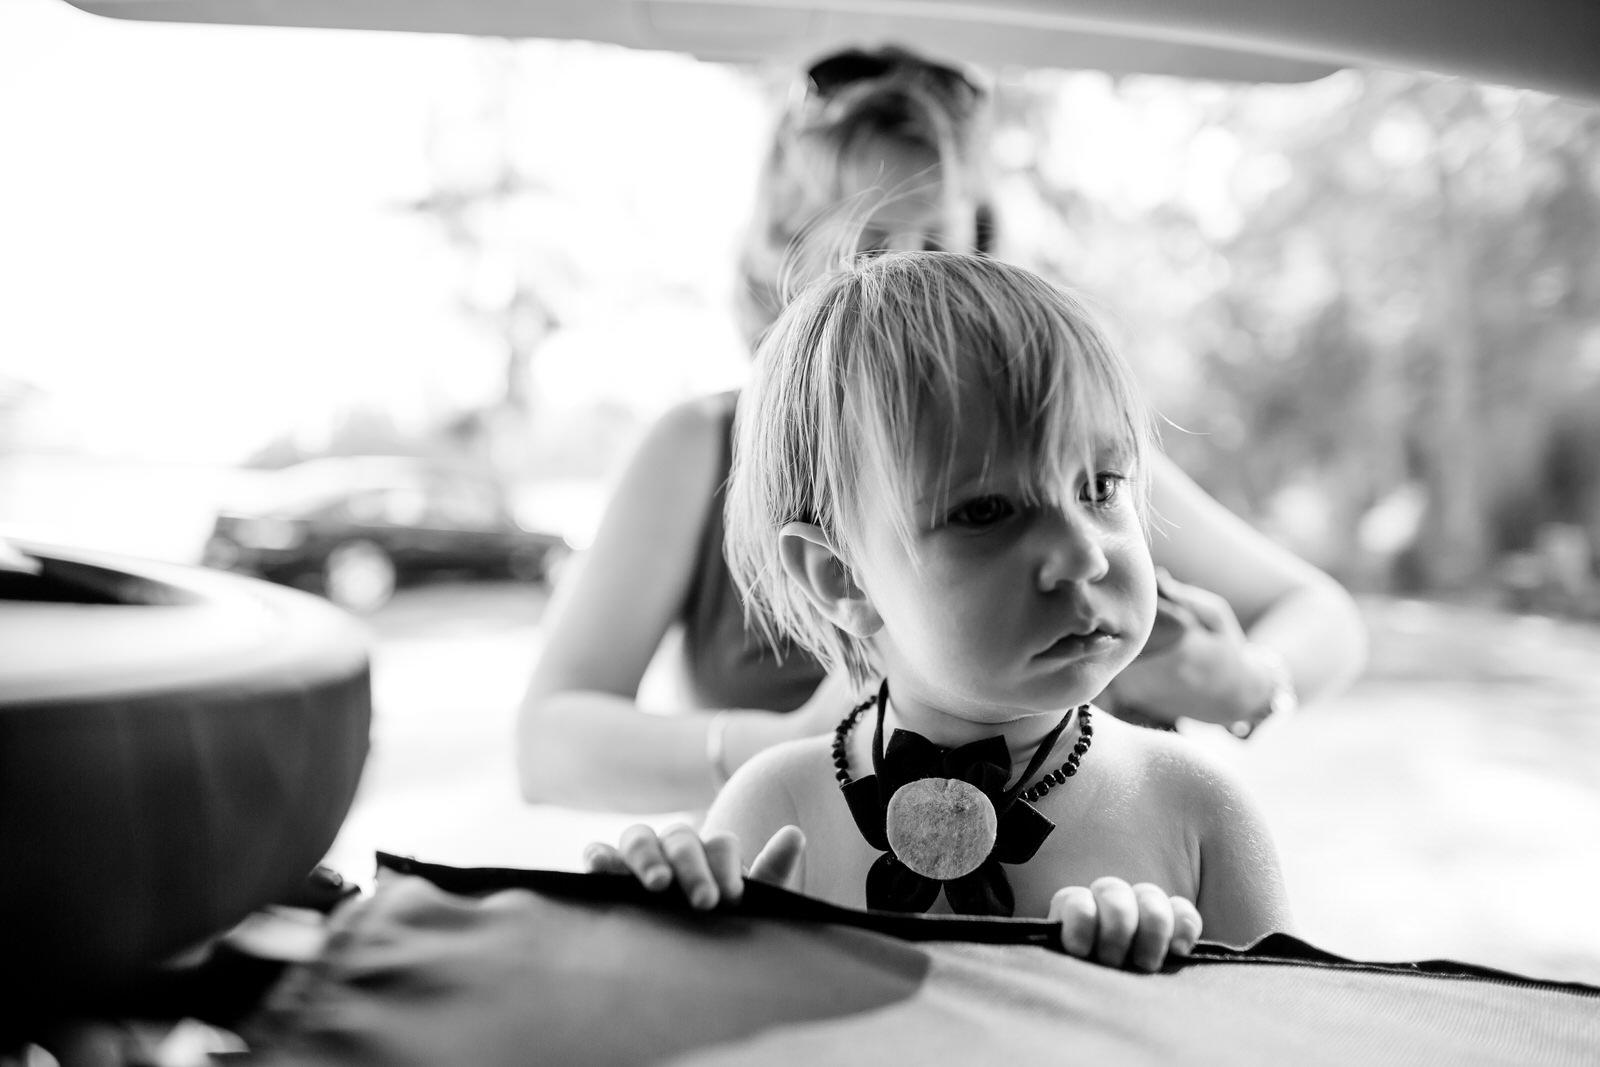 family_documentary_photography_tiny_house_photo_bedners_farmers_market_florida-2.jpg